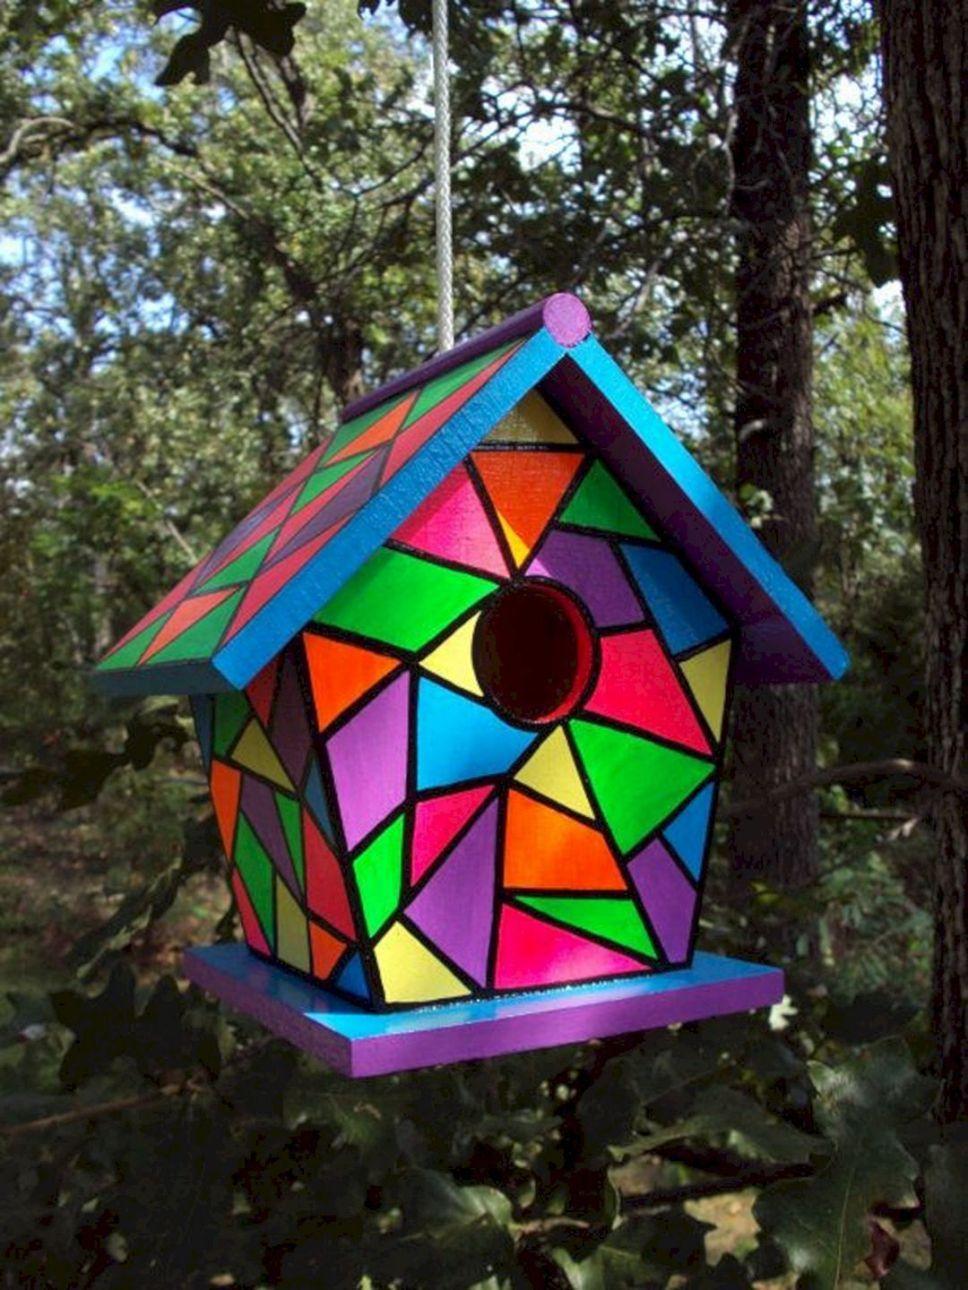 65 Cool Birdhouse Design Ideas To Make Birds Easily To Nest In Your Garden 19 Birdhouse Designs Bird Houses Painted Bird Houses